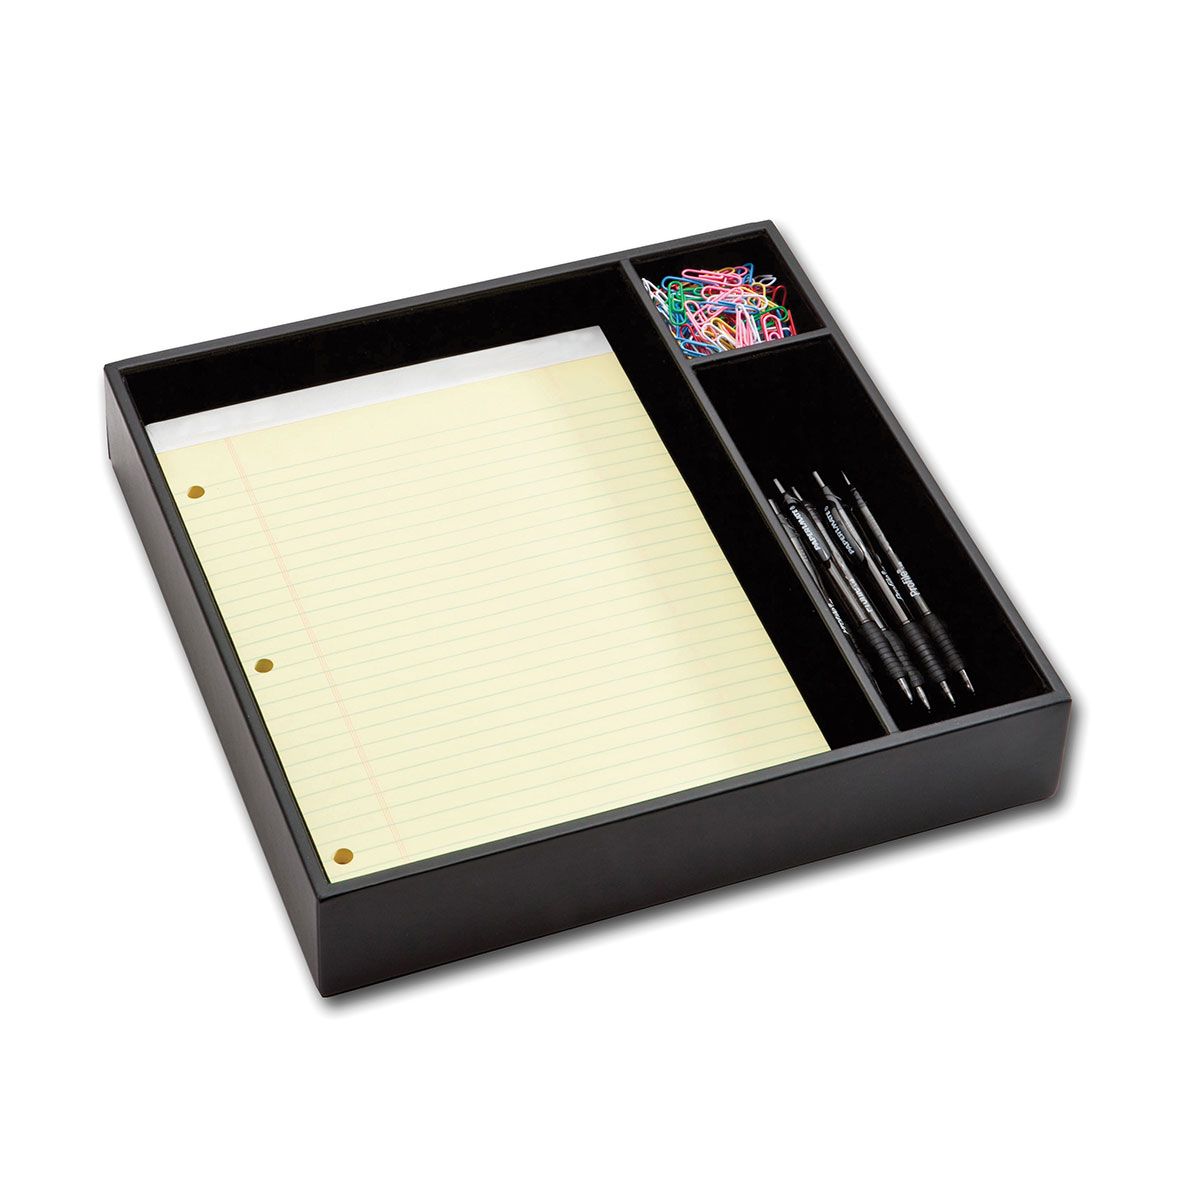 Pad & Pen Organizer - Black